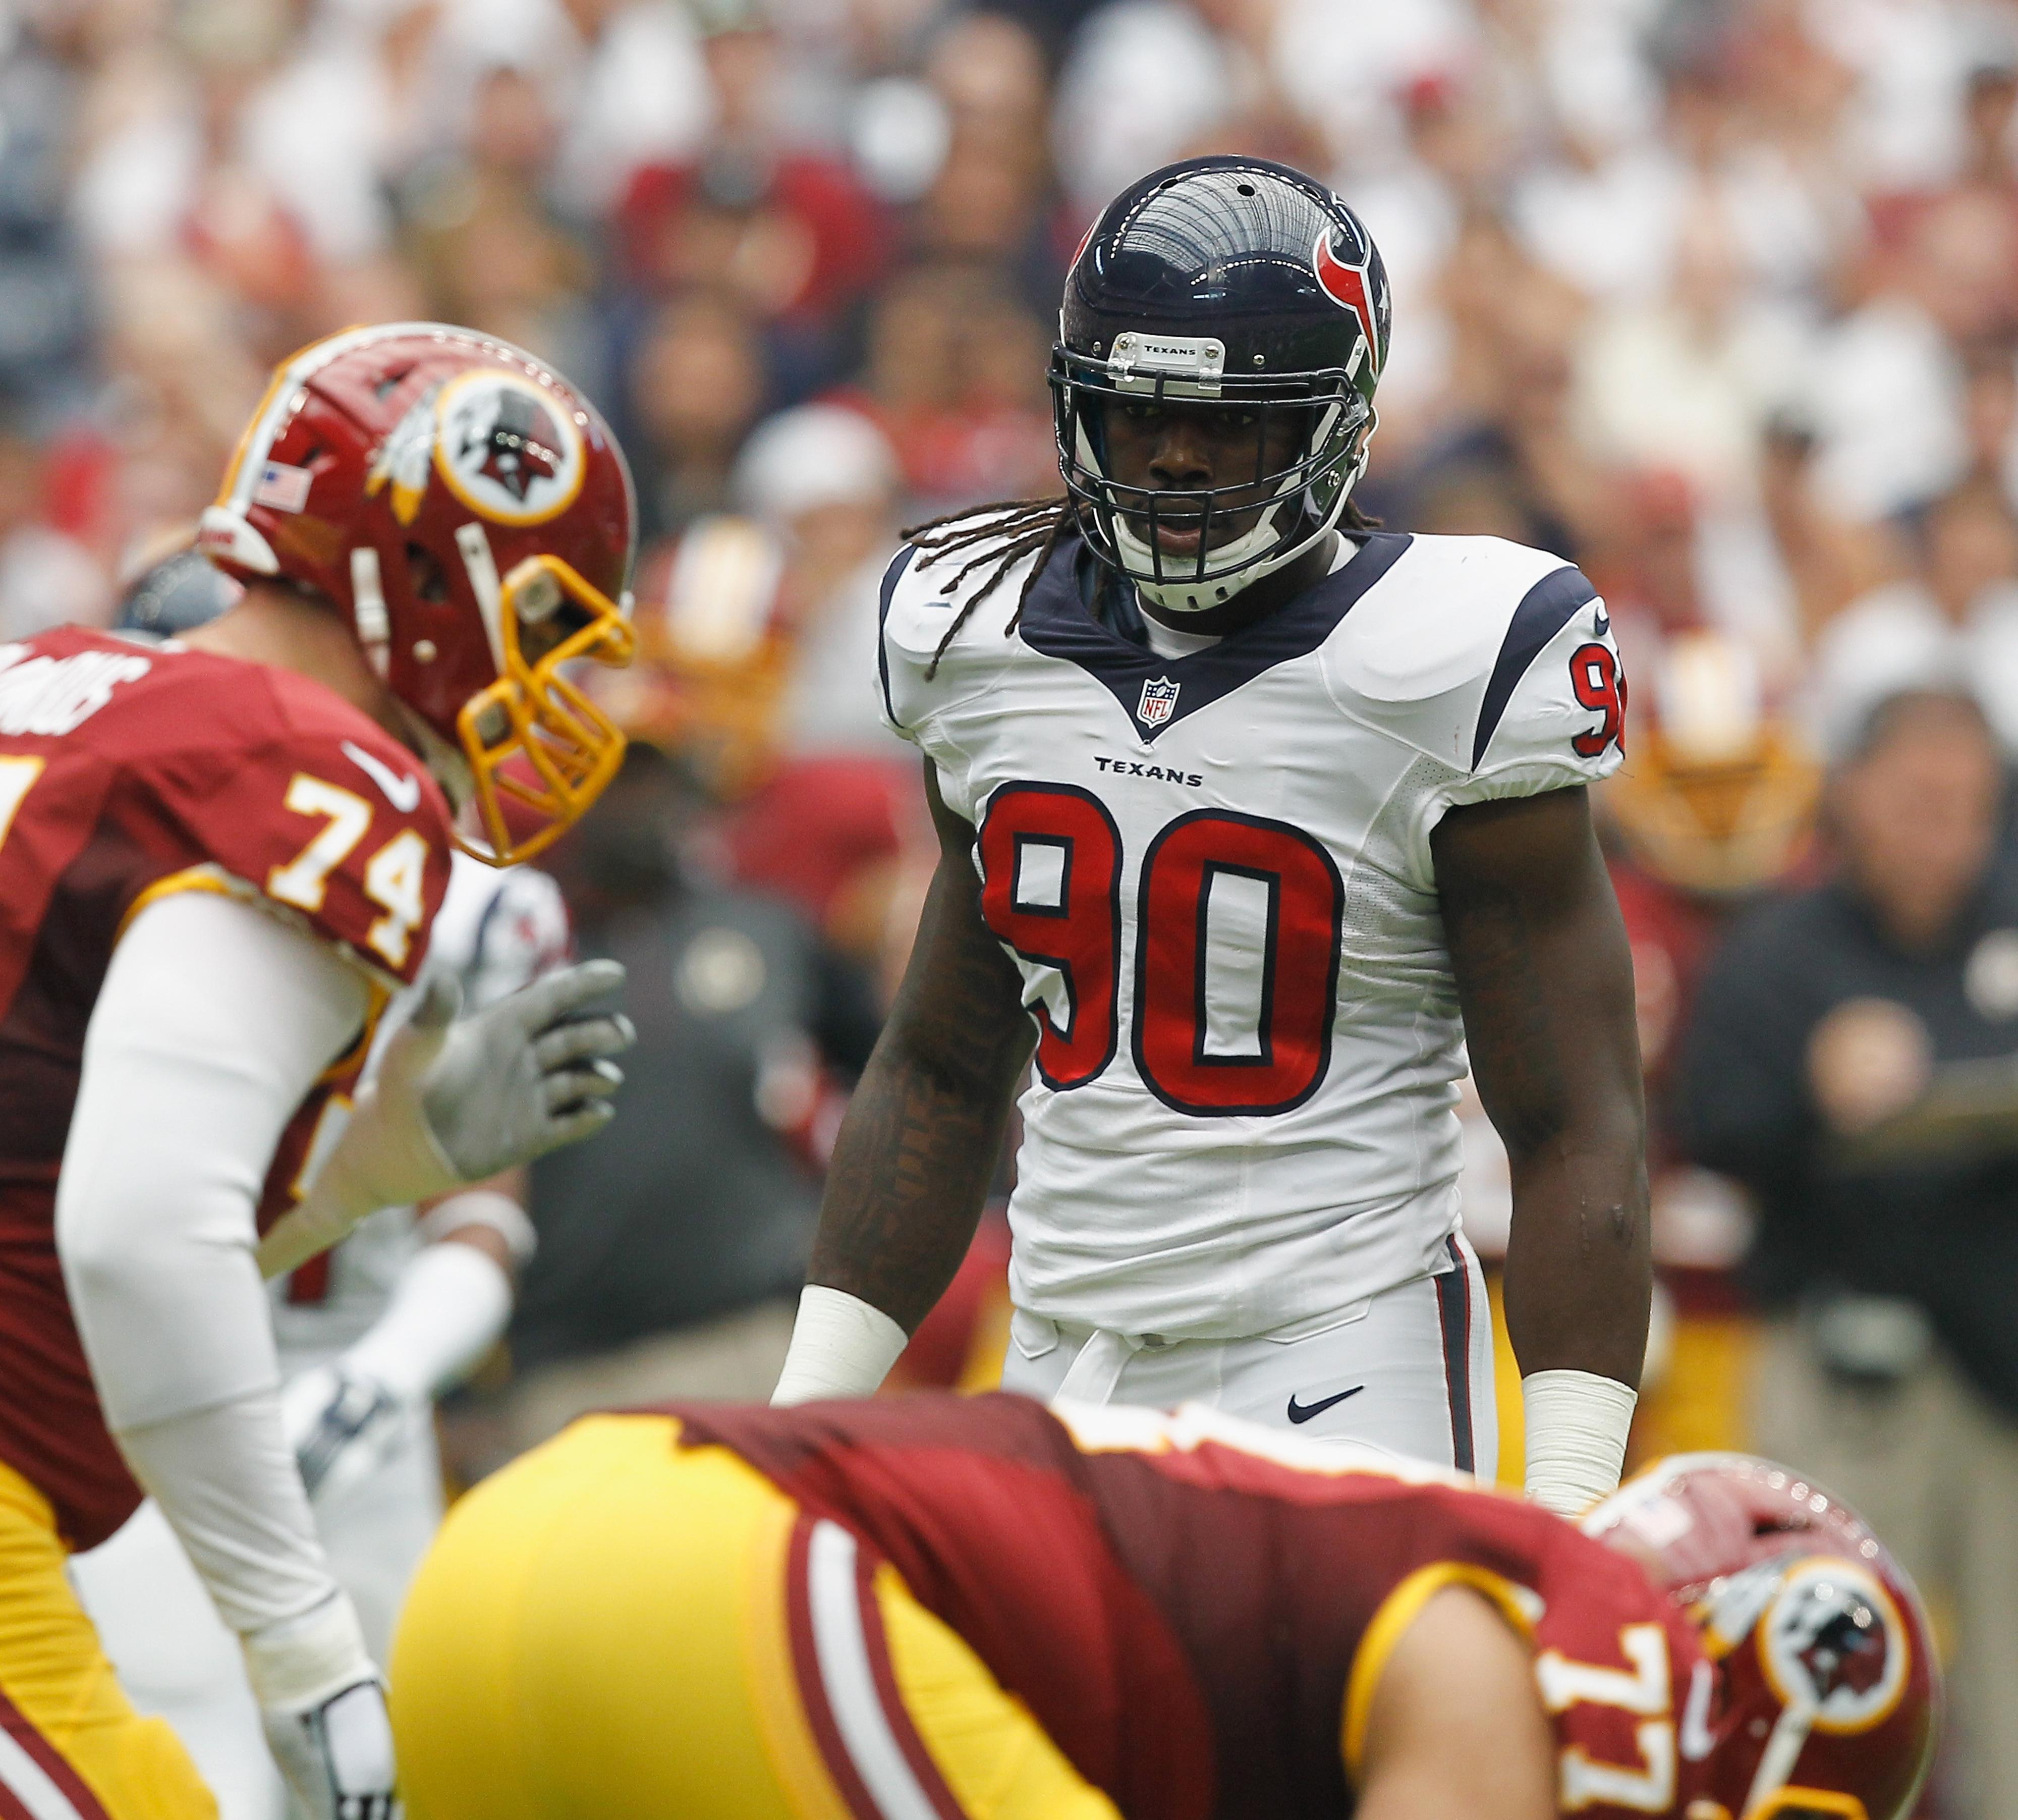 Jadeveon Clowney knee injury may require surgery, Texans fear